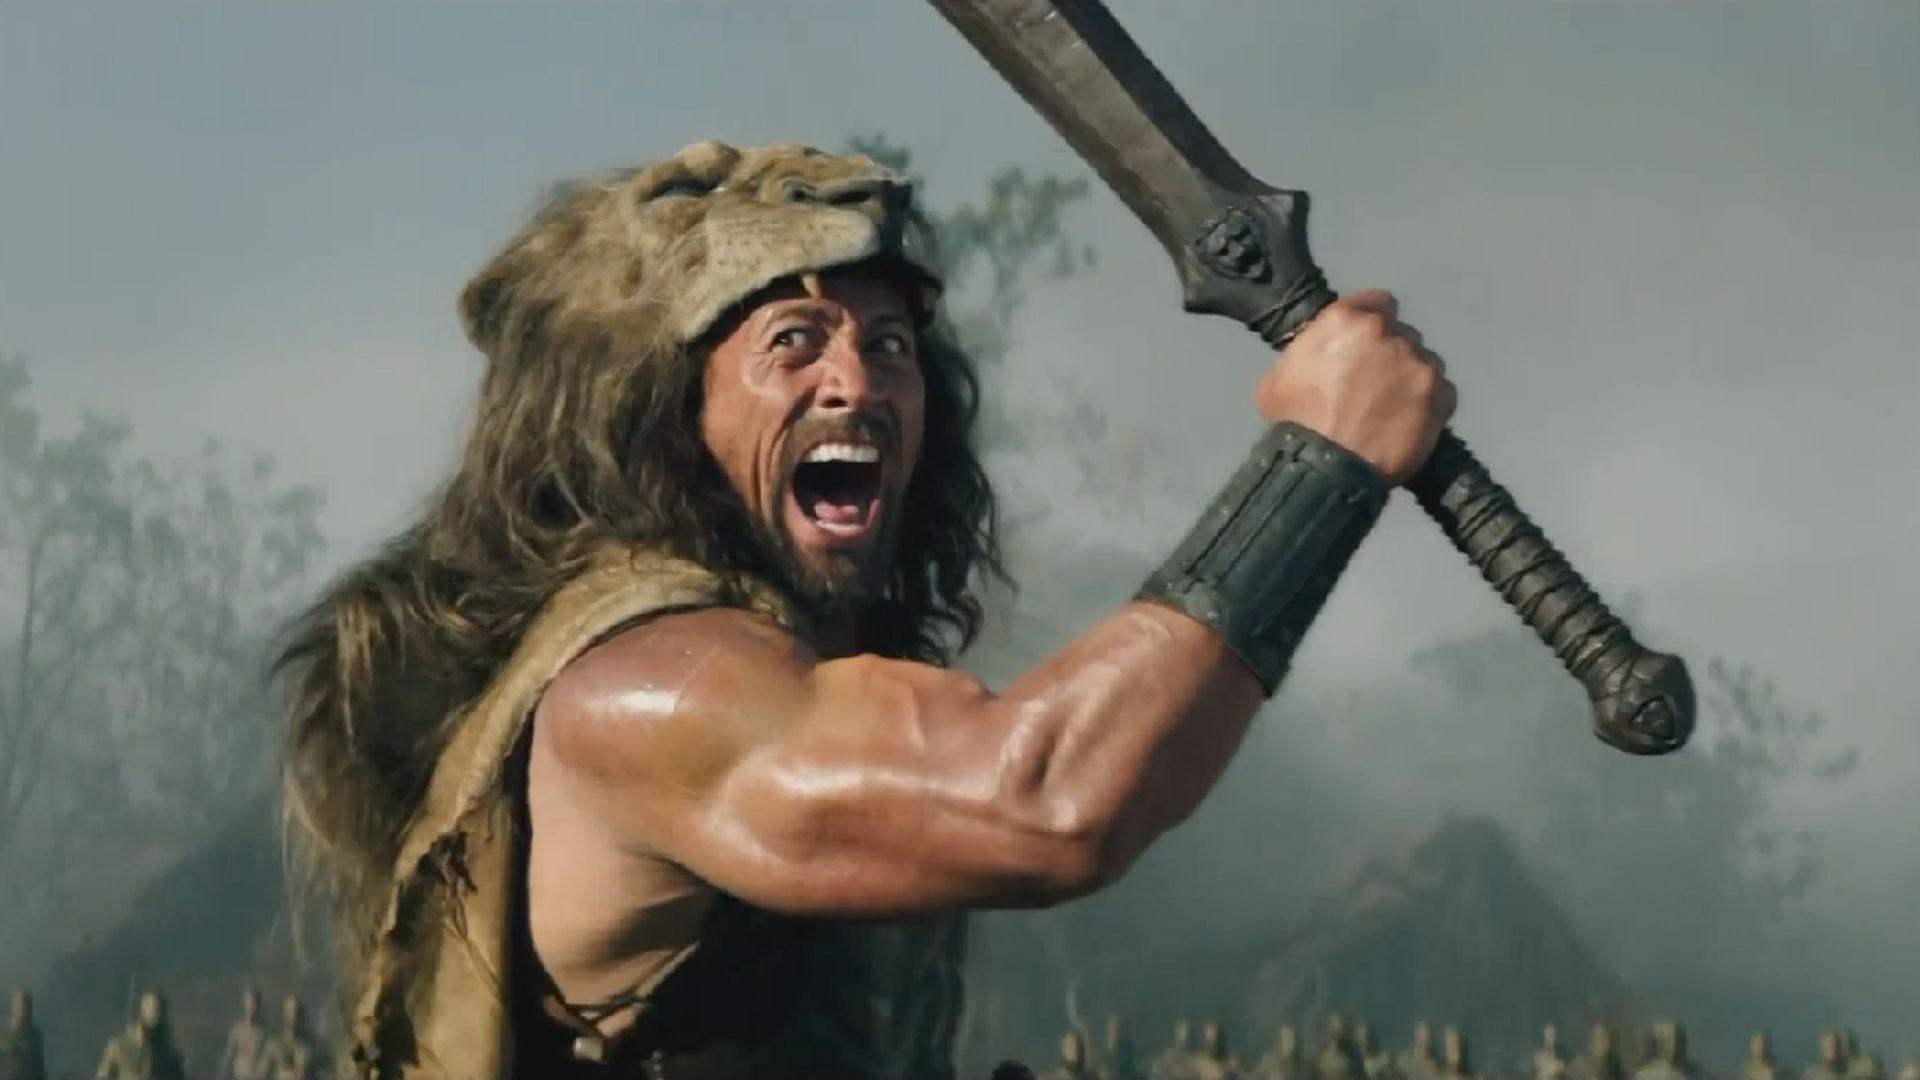 New Hercules movie wallpapers 2014